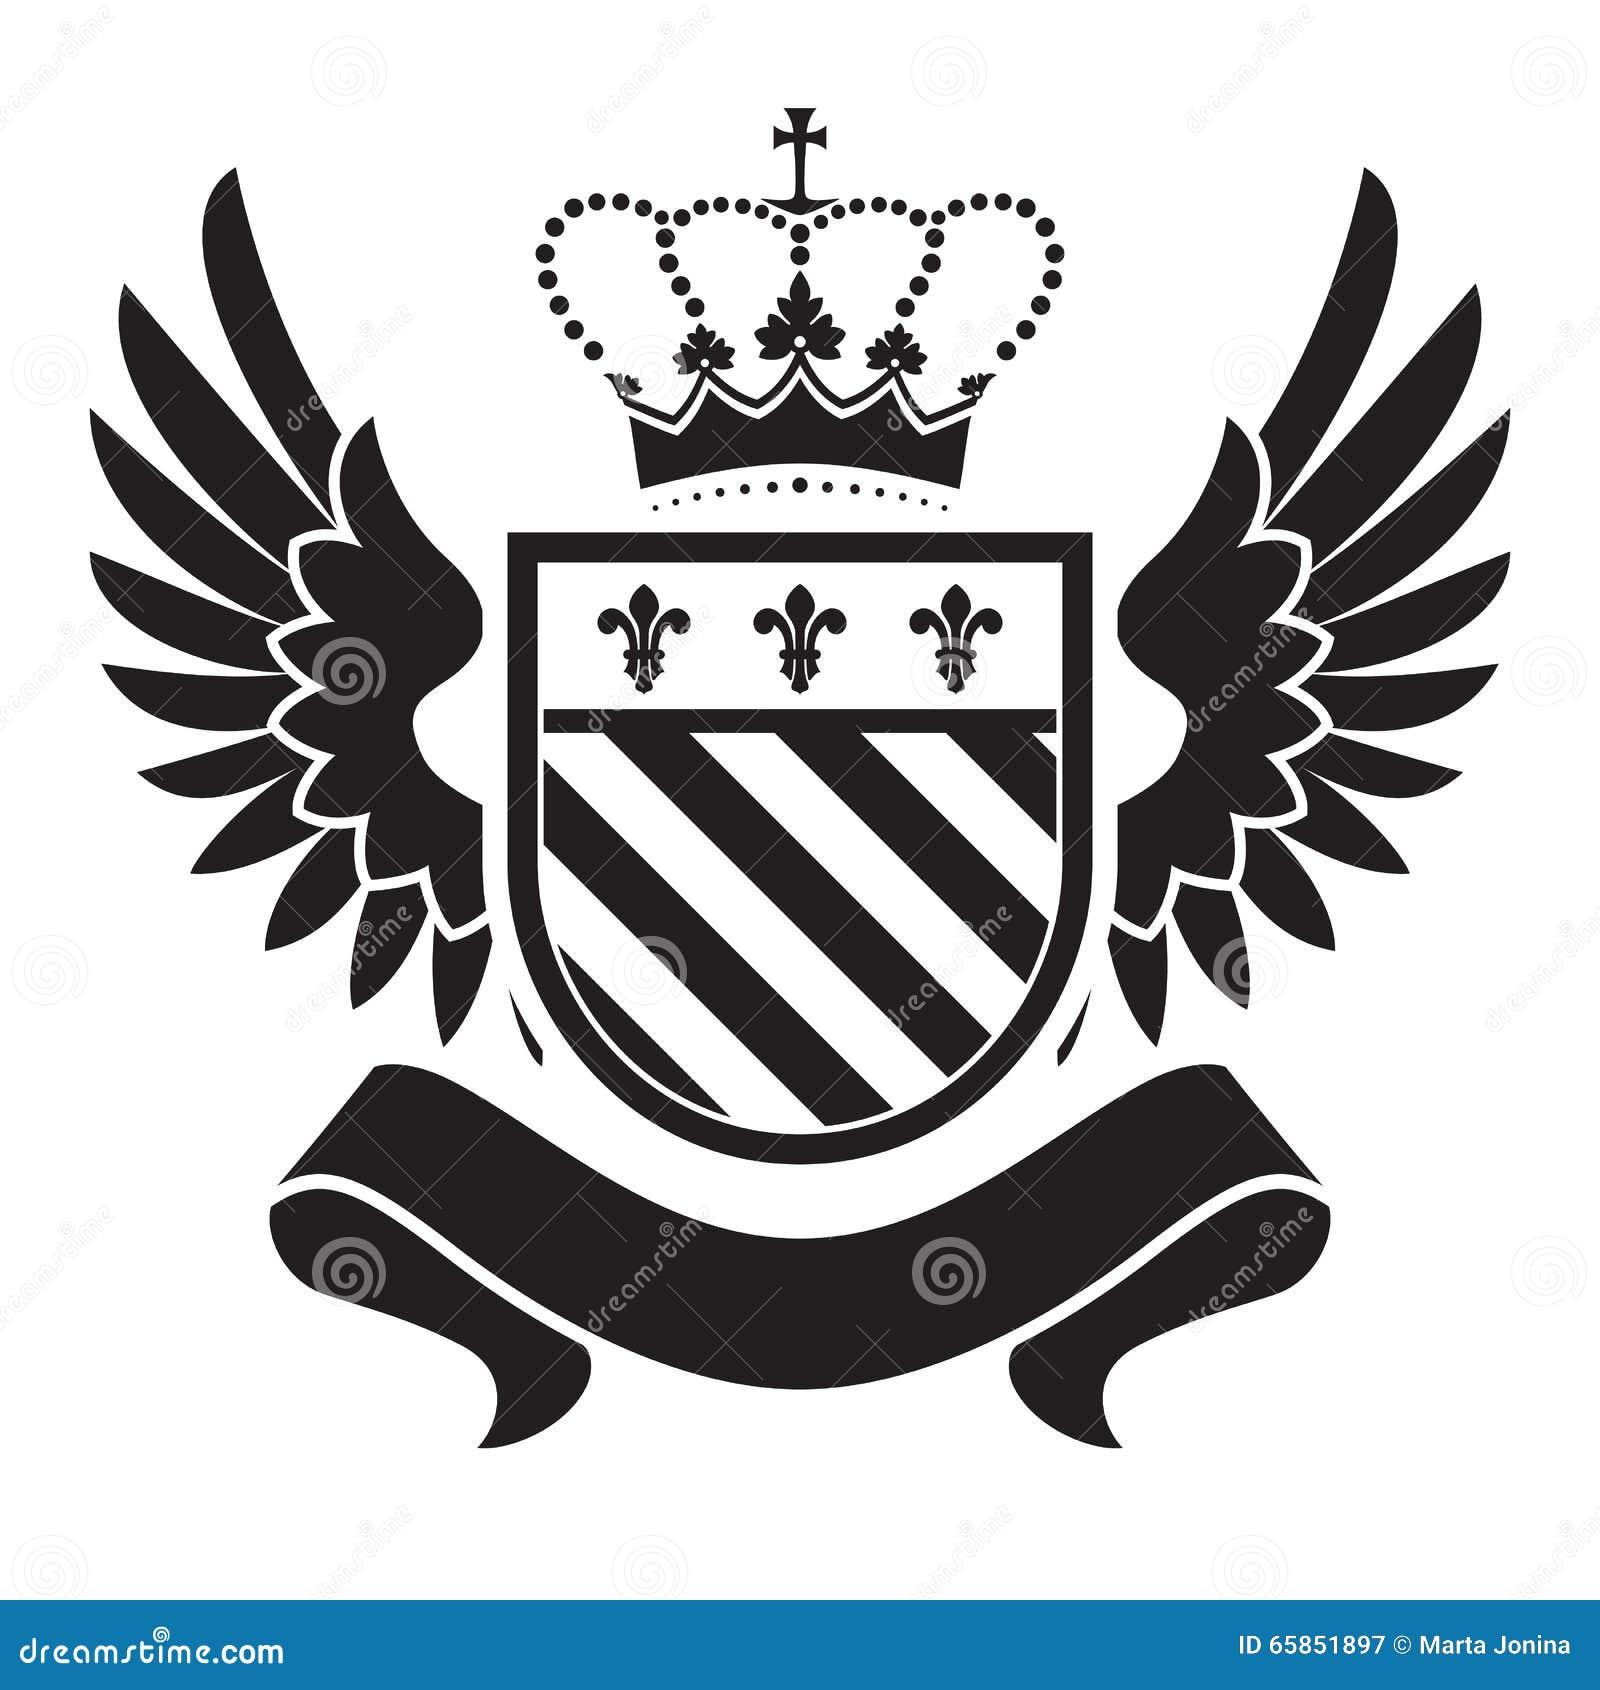 Haiti Design Picture For Logo